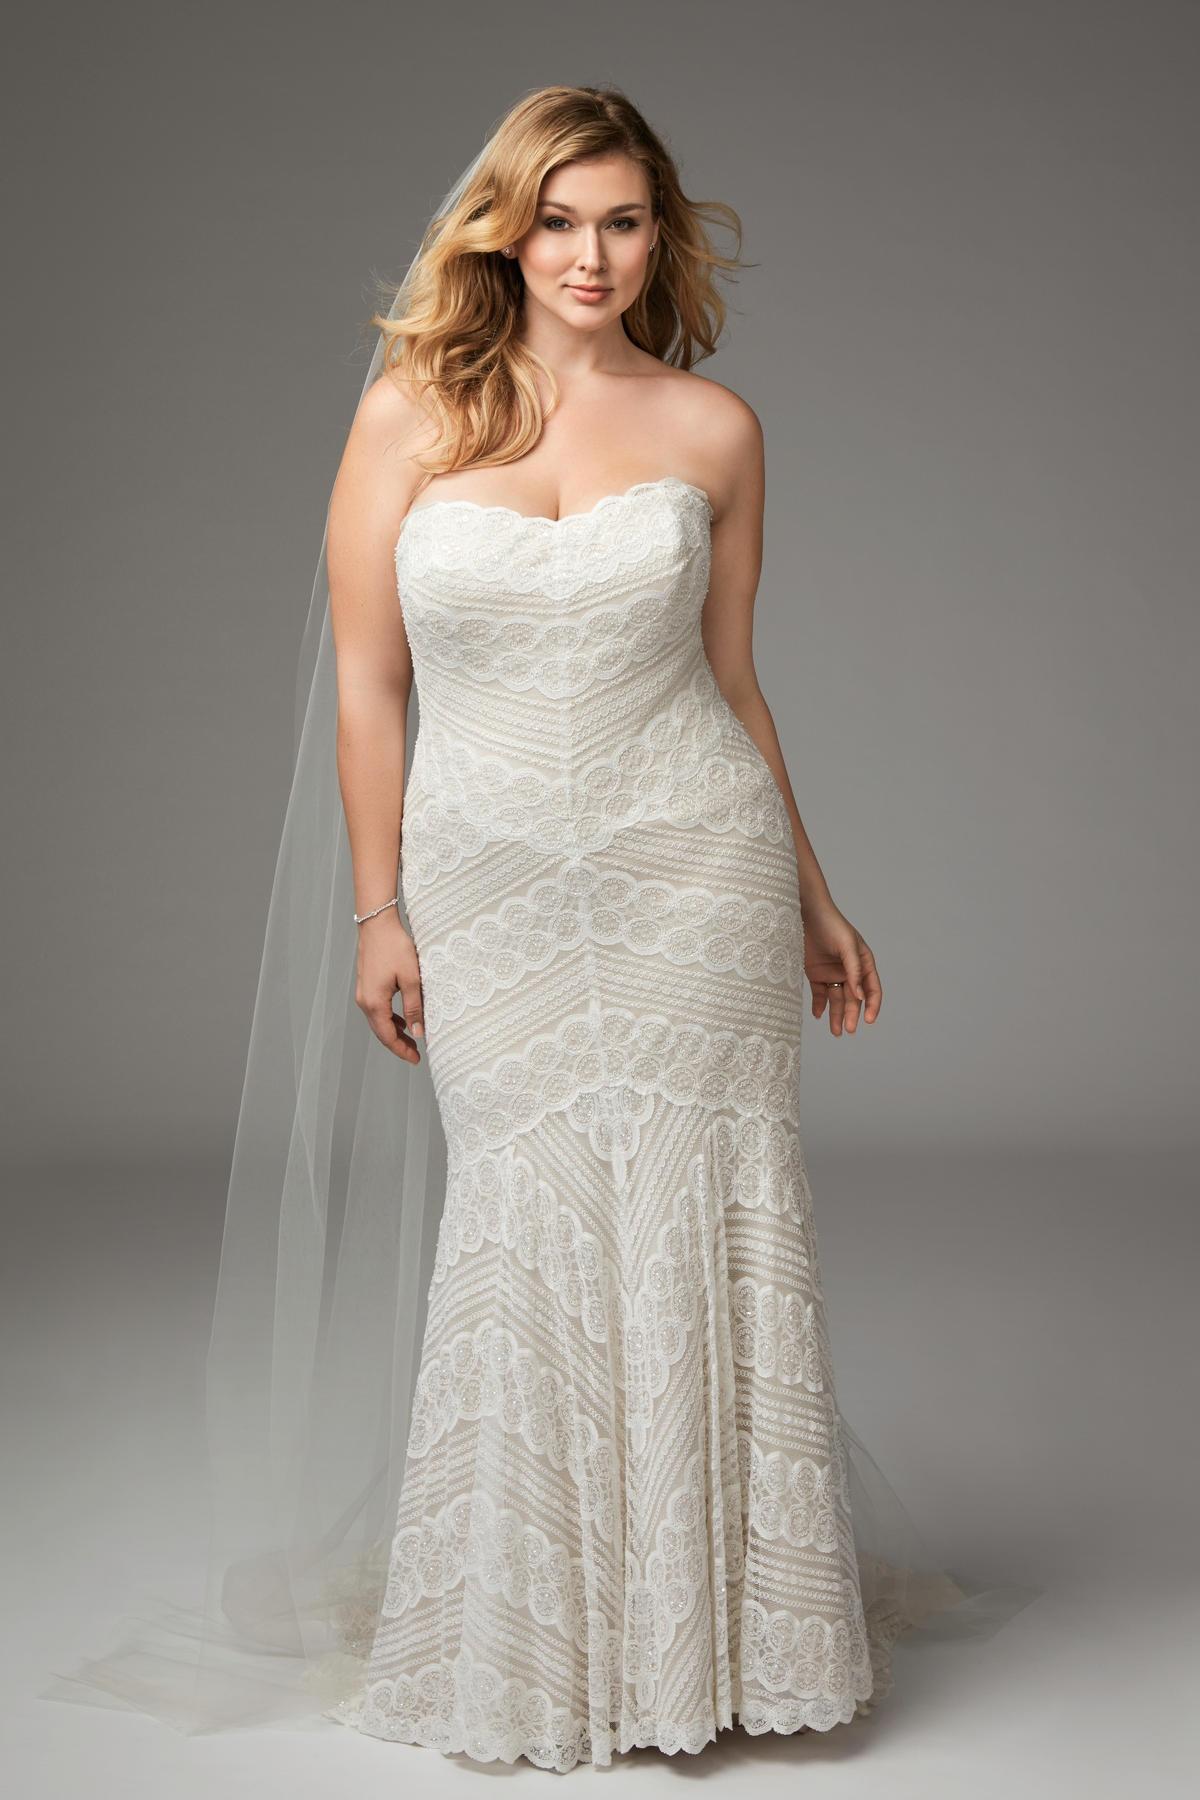 wedding dresses for plus size bride photo - 1